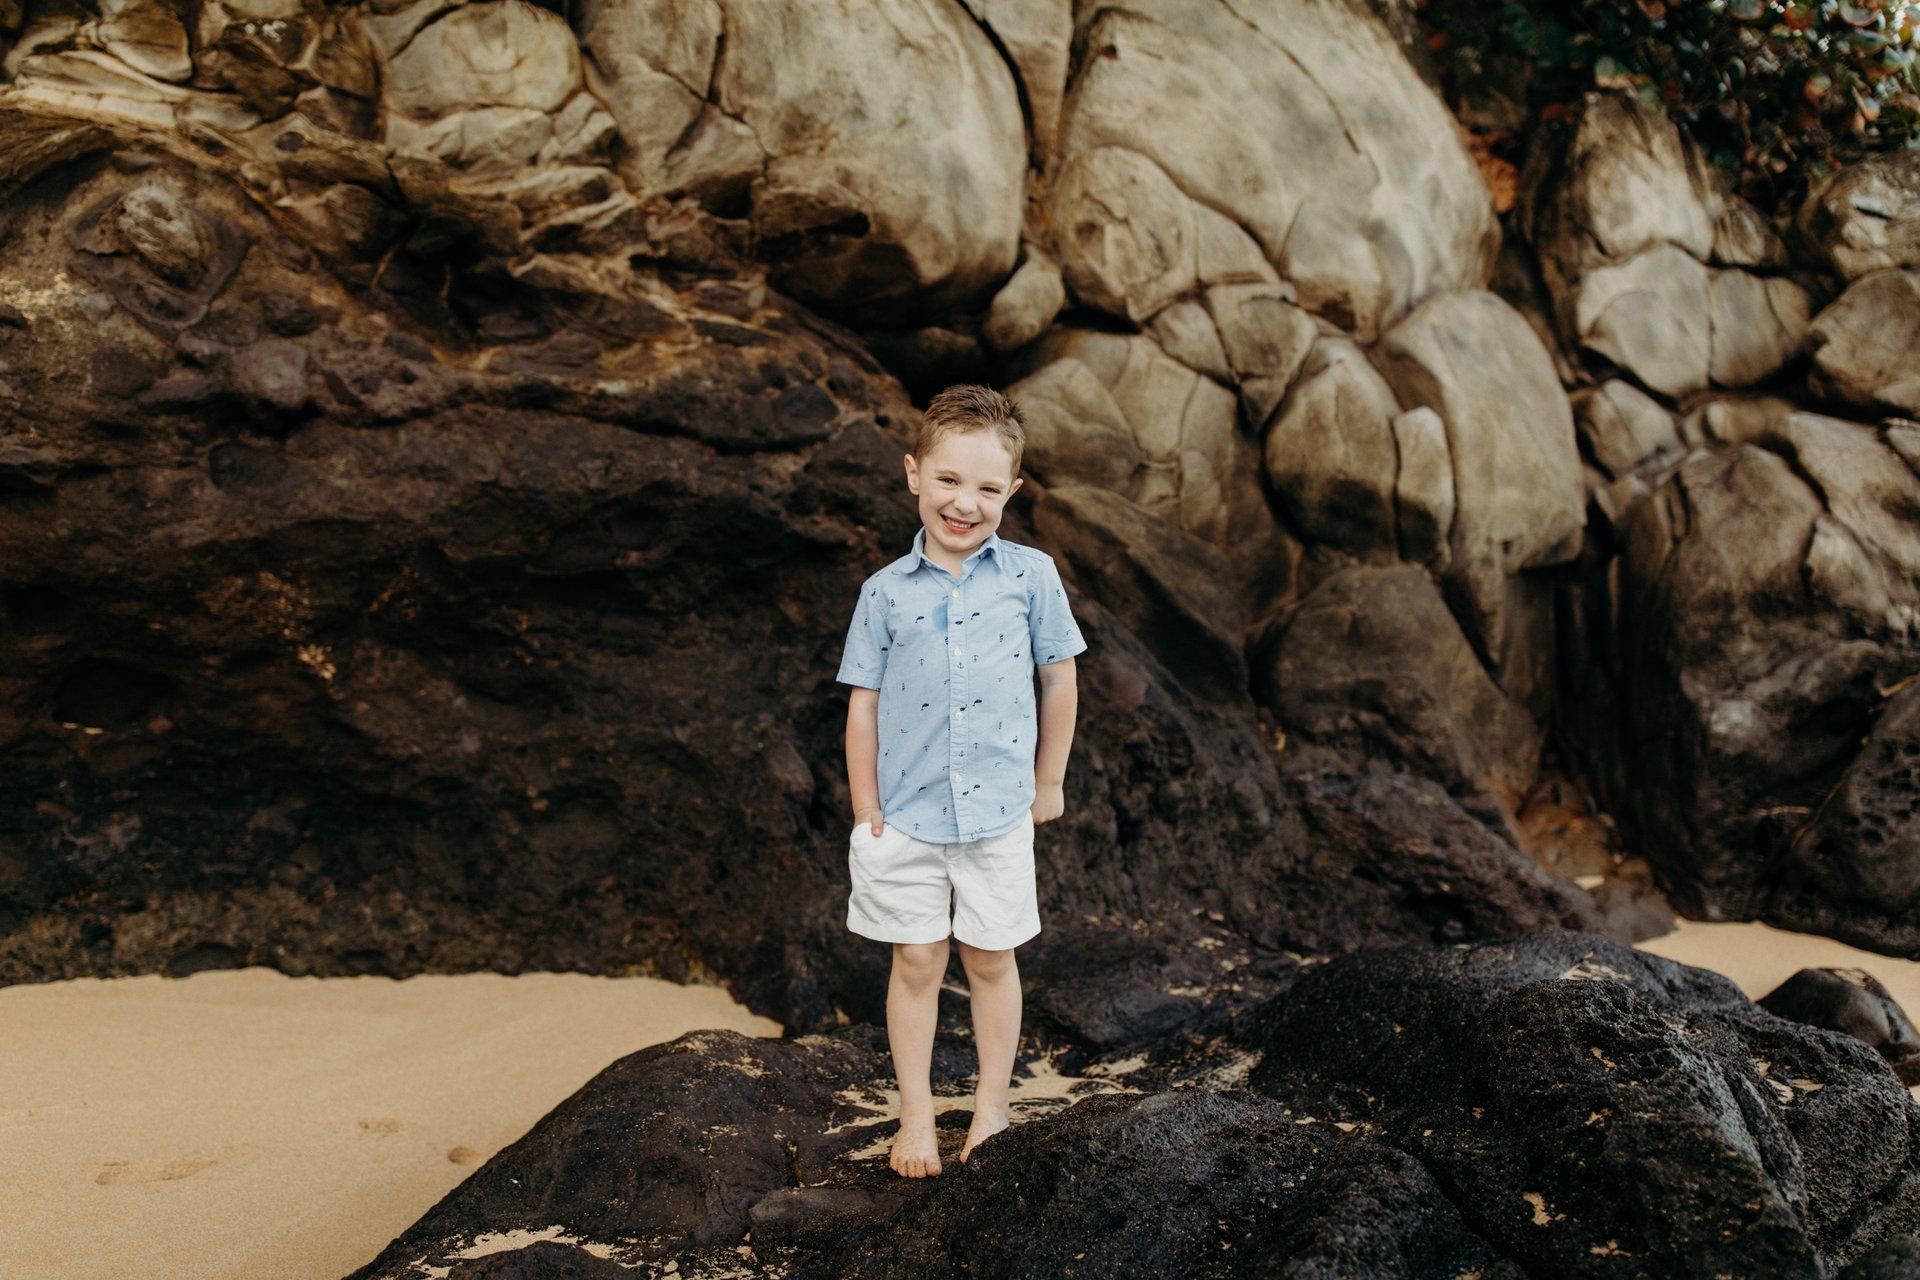 Maui-USA-travel-story-Flytographer-11